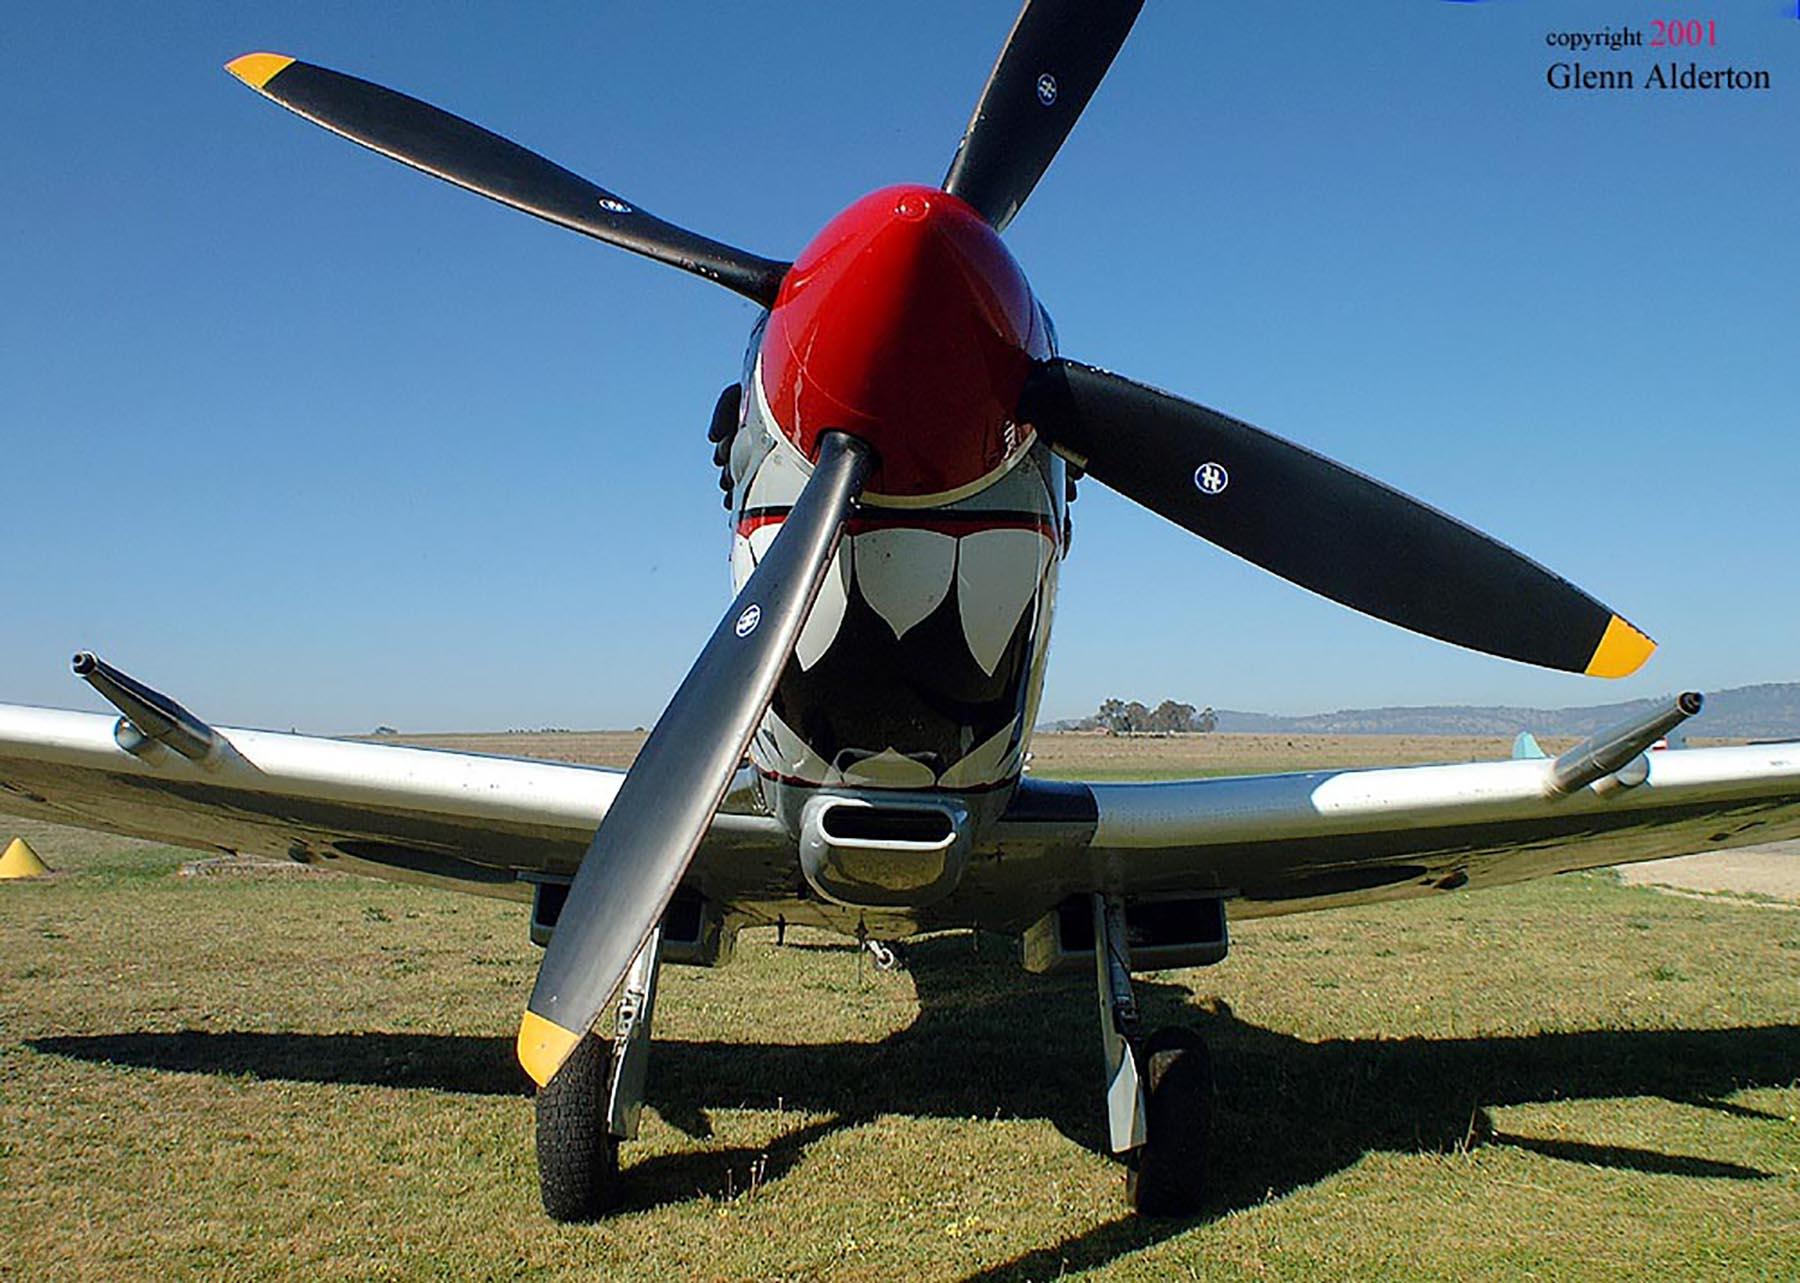 Airworthy Spitfire warbird RAAF 457Sqn RGV A58 602 07